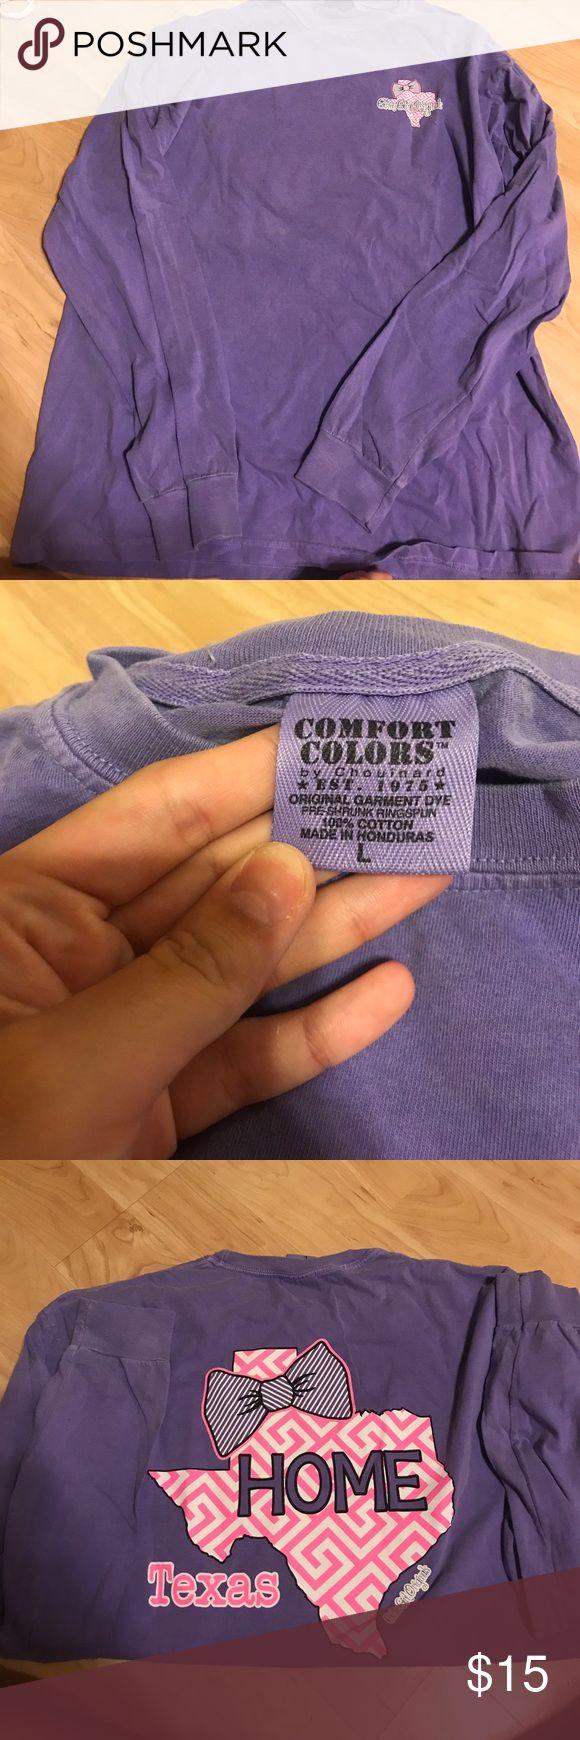 Long sleeve tshirt Never worn! Perfect tee girly girl originals Tops Tees - Short Sleeve